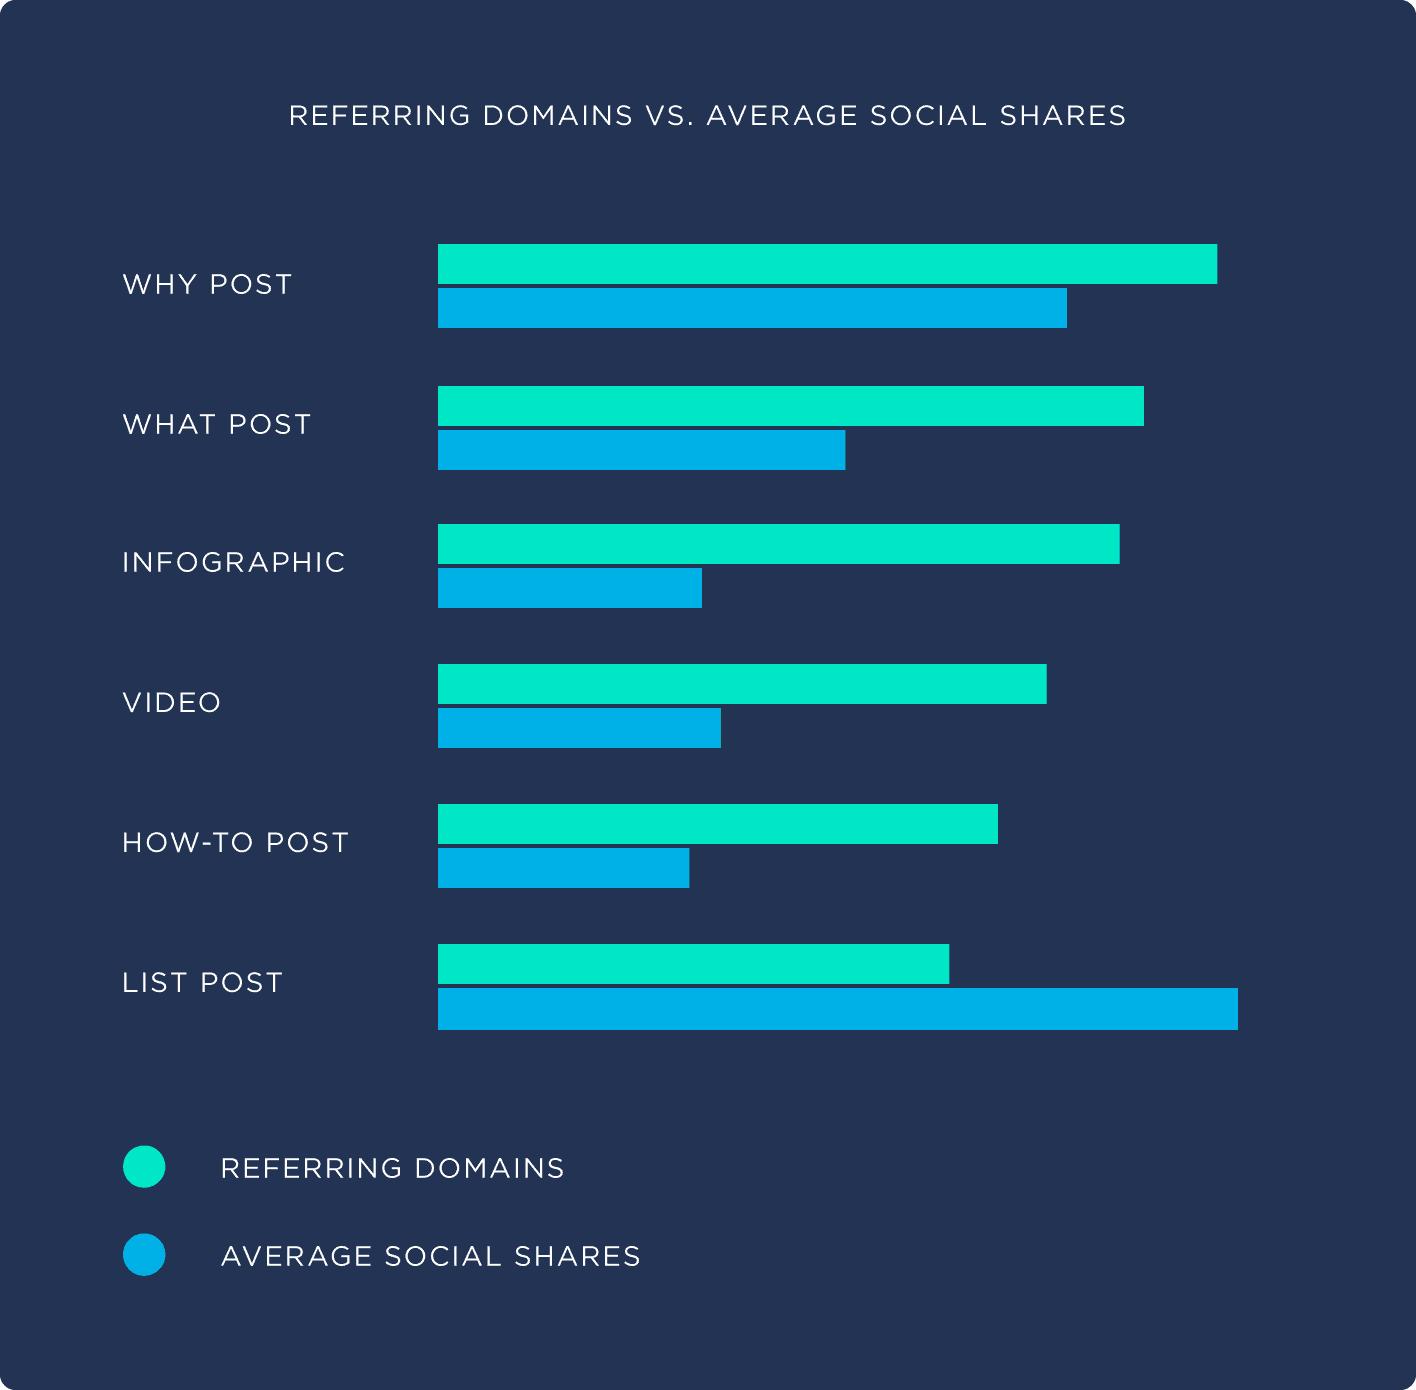 Referring domains .vs. Average social shares